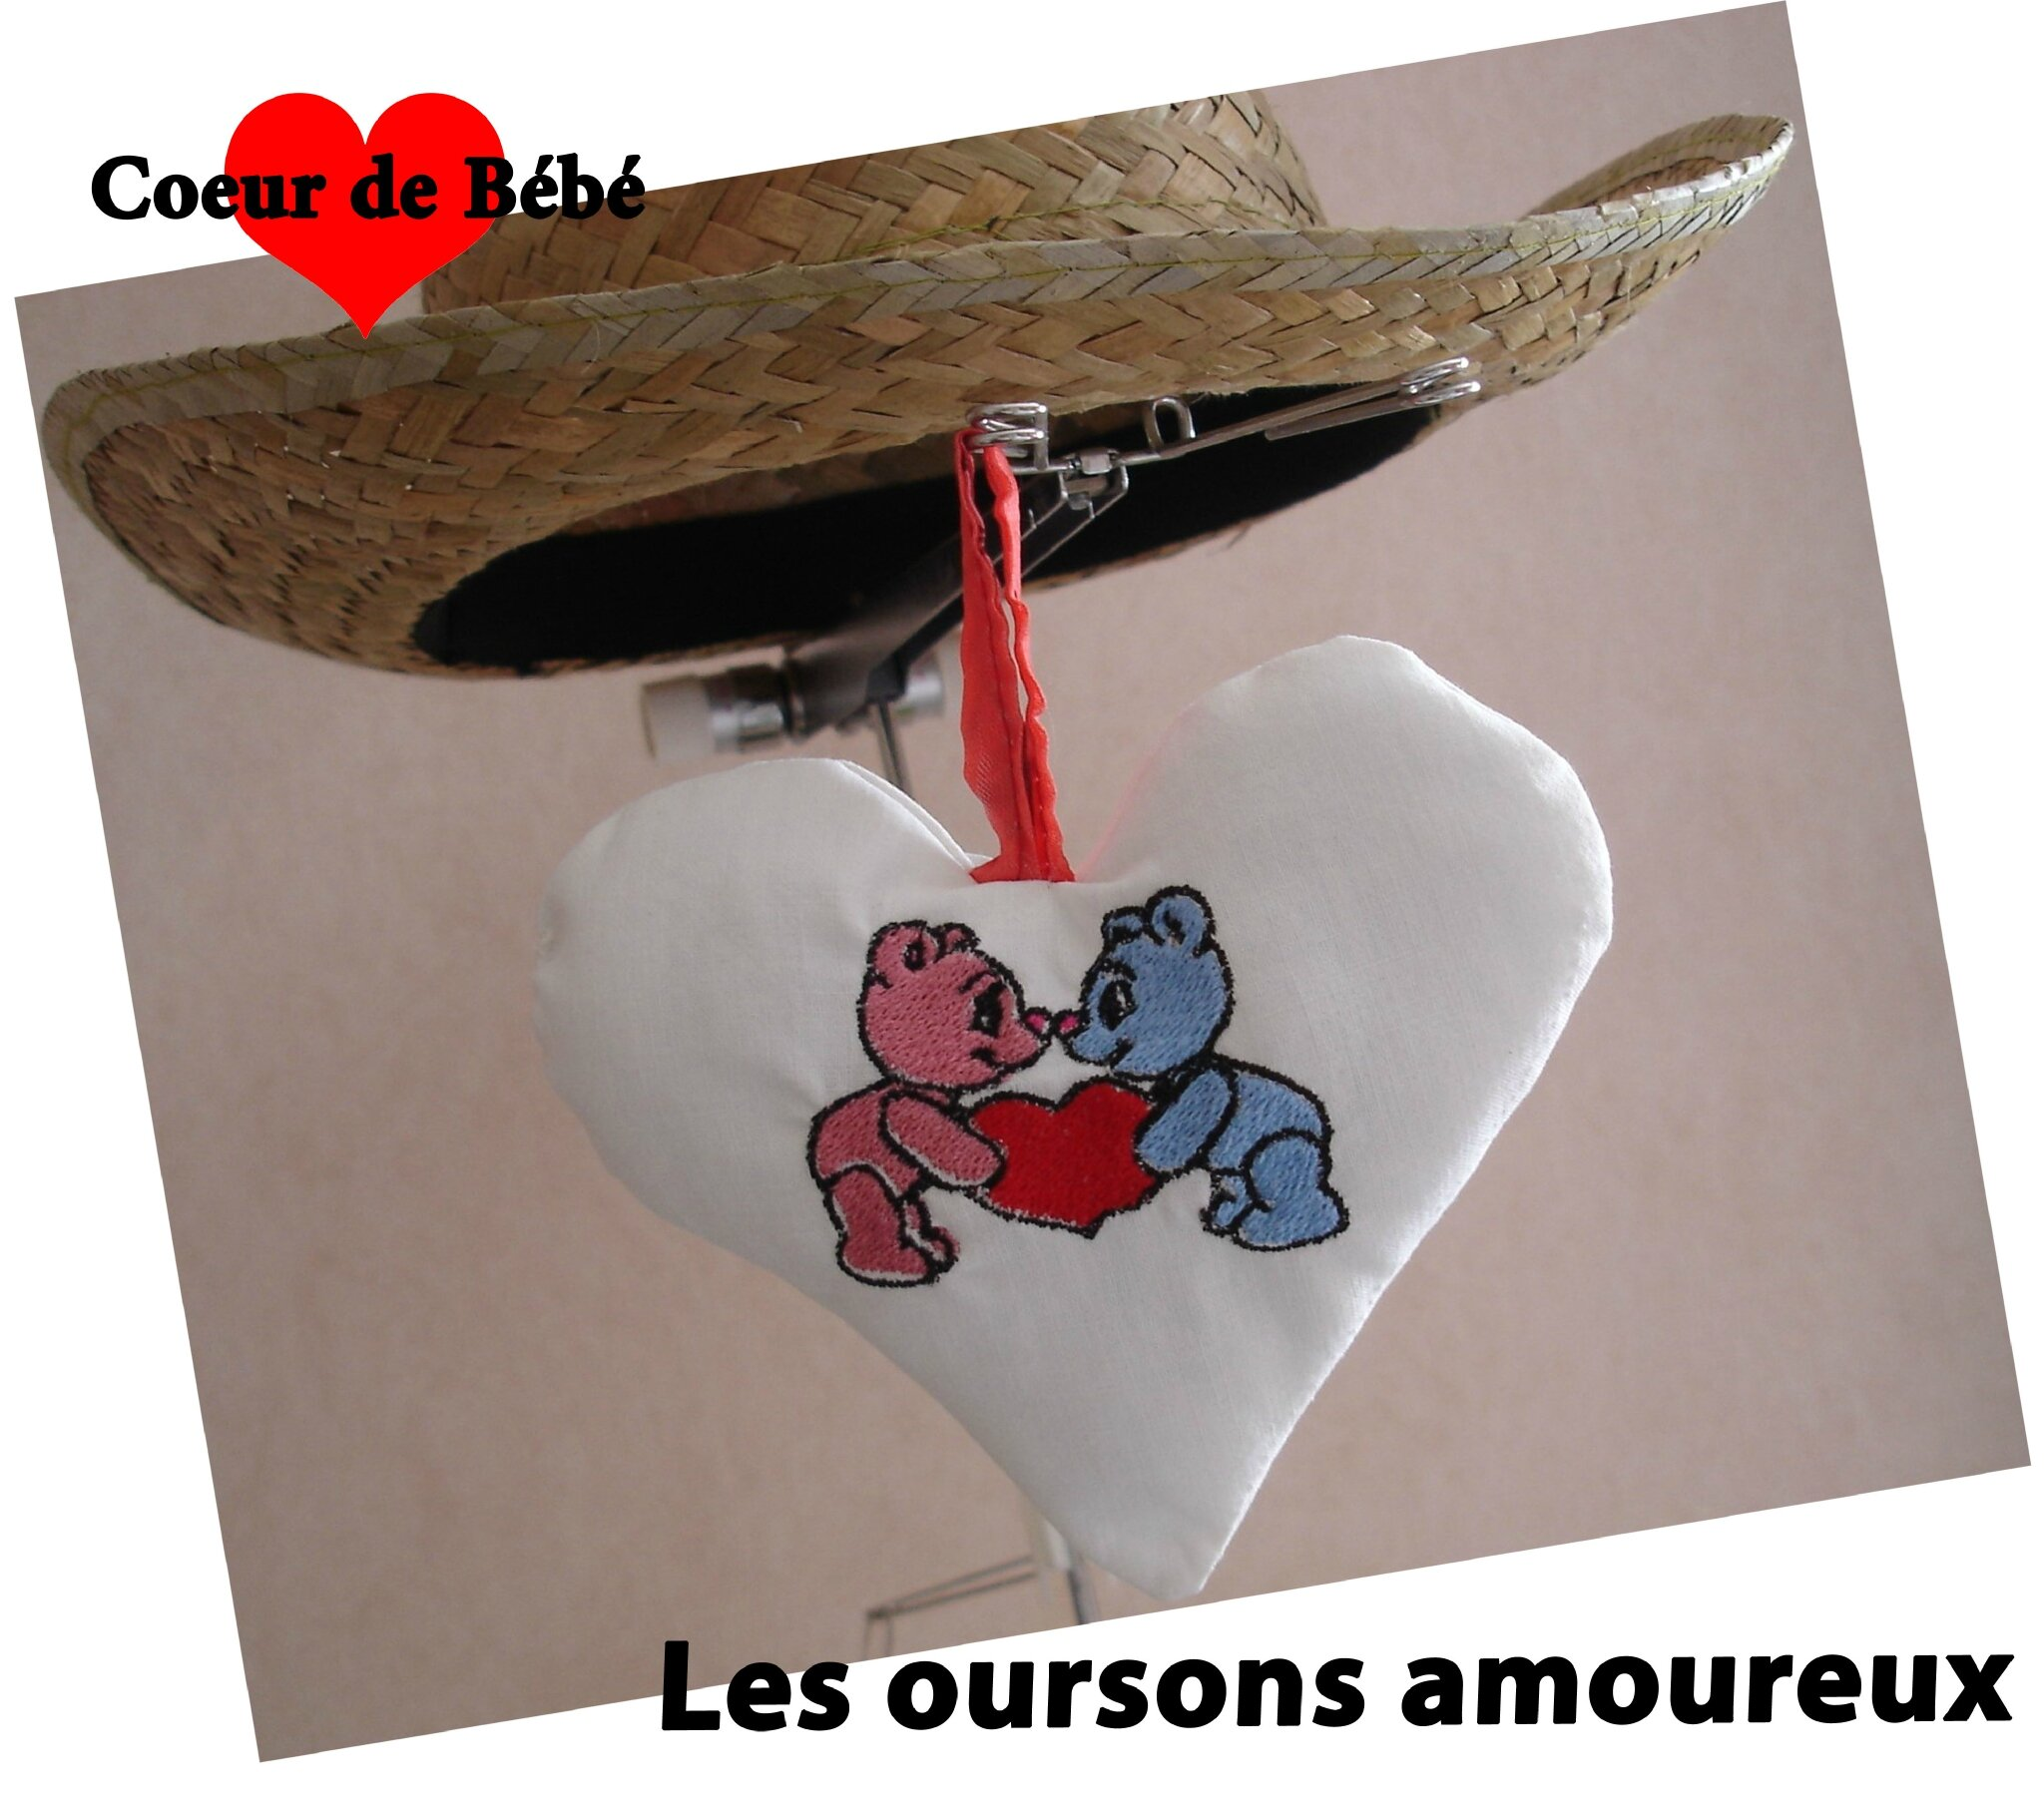 oursons amoureux